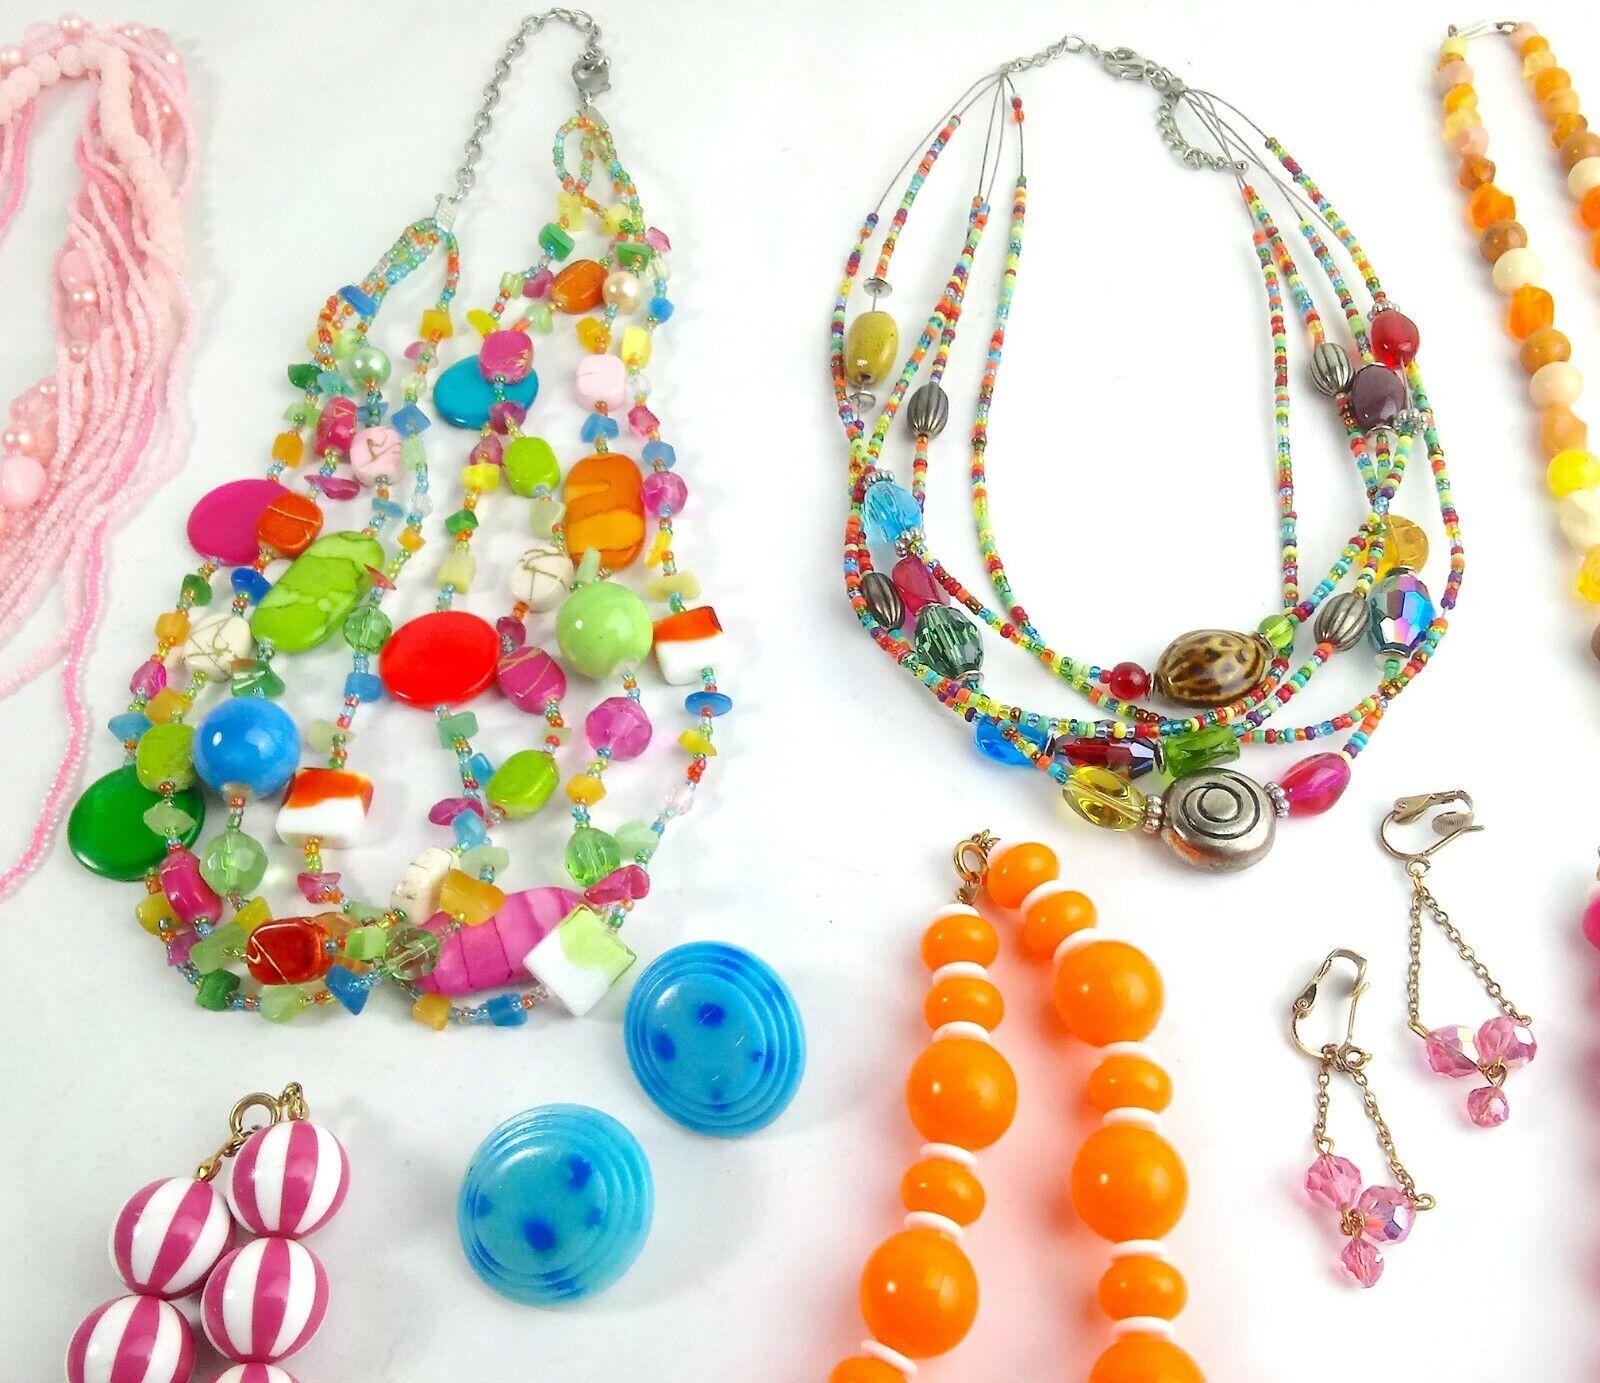 Costume Jewelry Lot Necklaces Bracelet Earrings - image 3